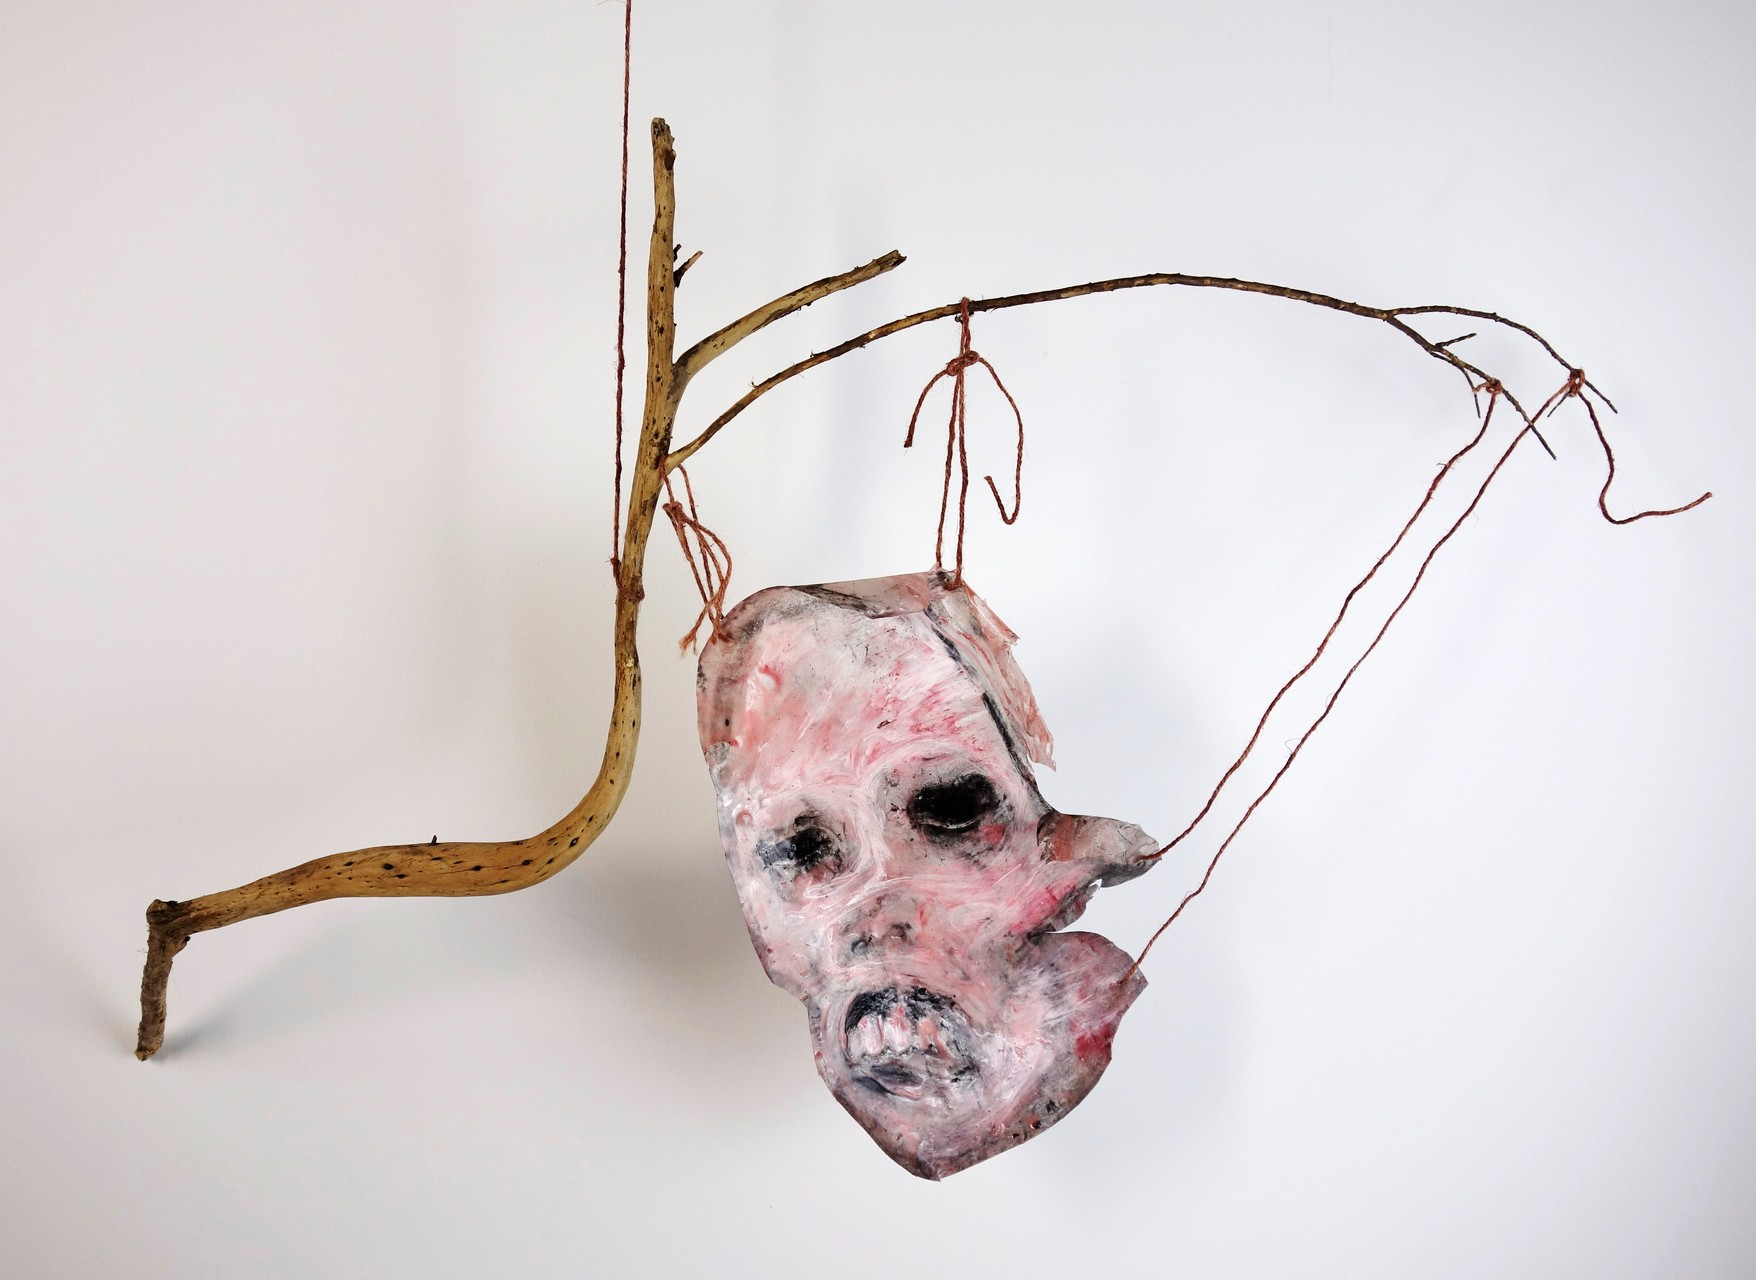 Fragiles Gleichgewicht I, 2015, Holz, Silikon, Pigmente, ca. 84 x 50 cm